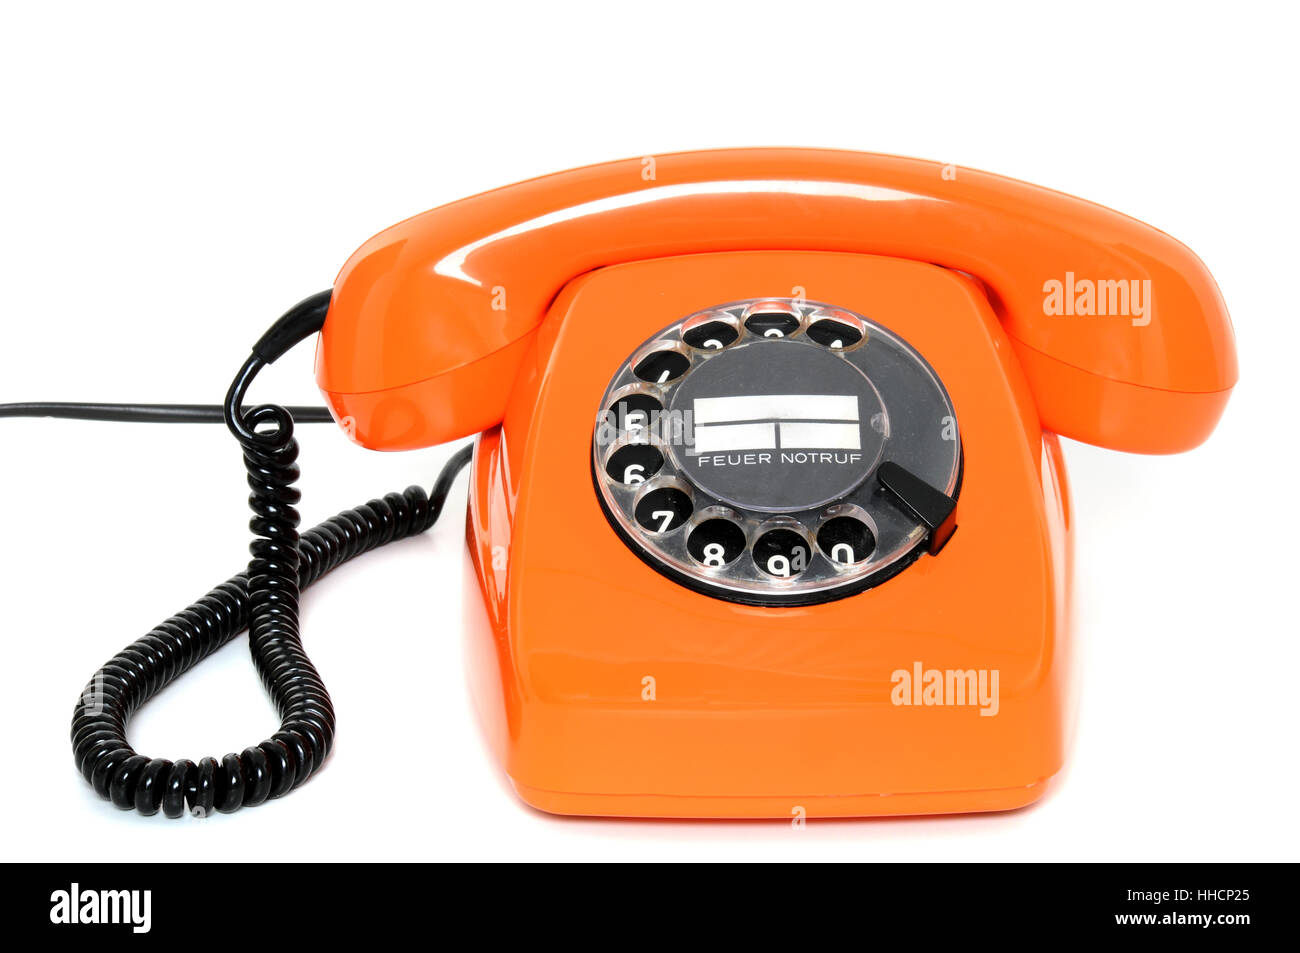 phone - Stock Image